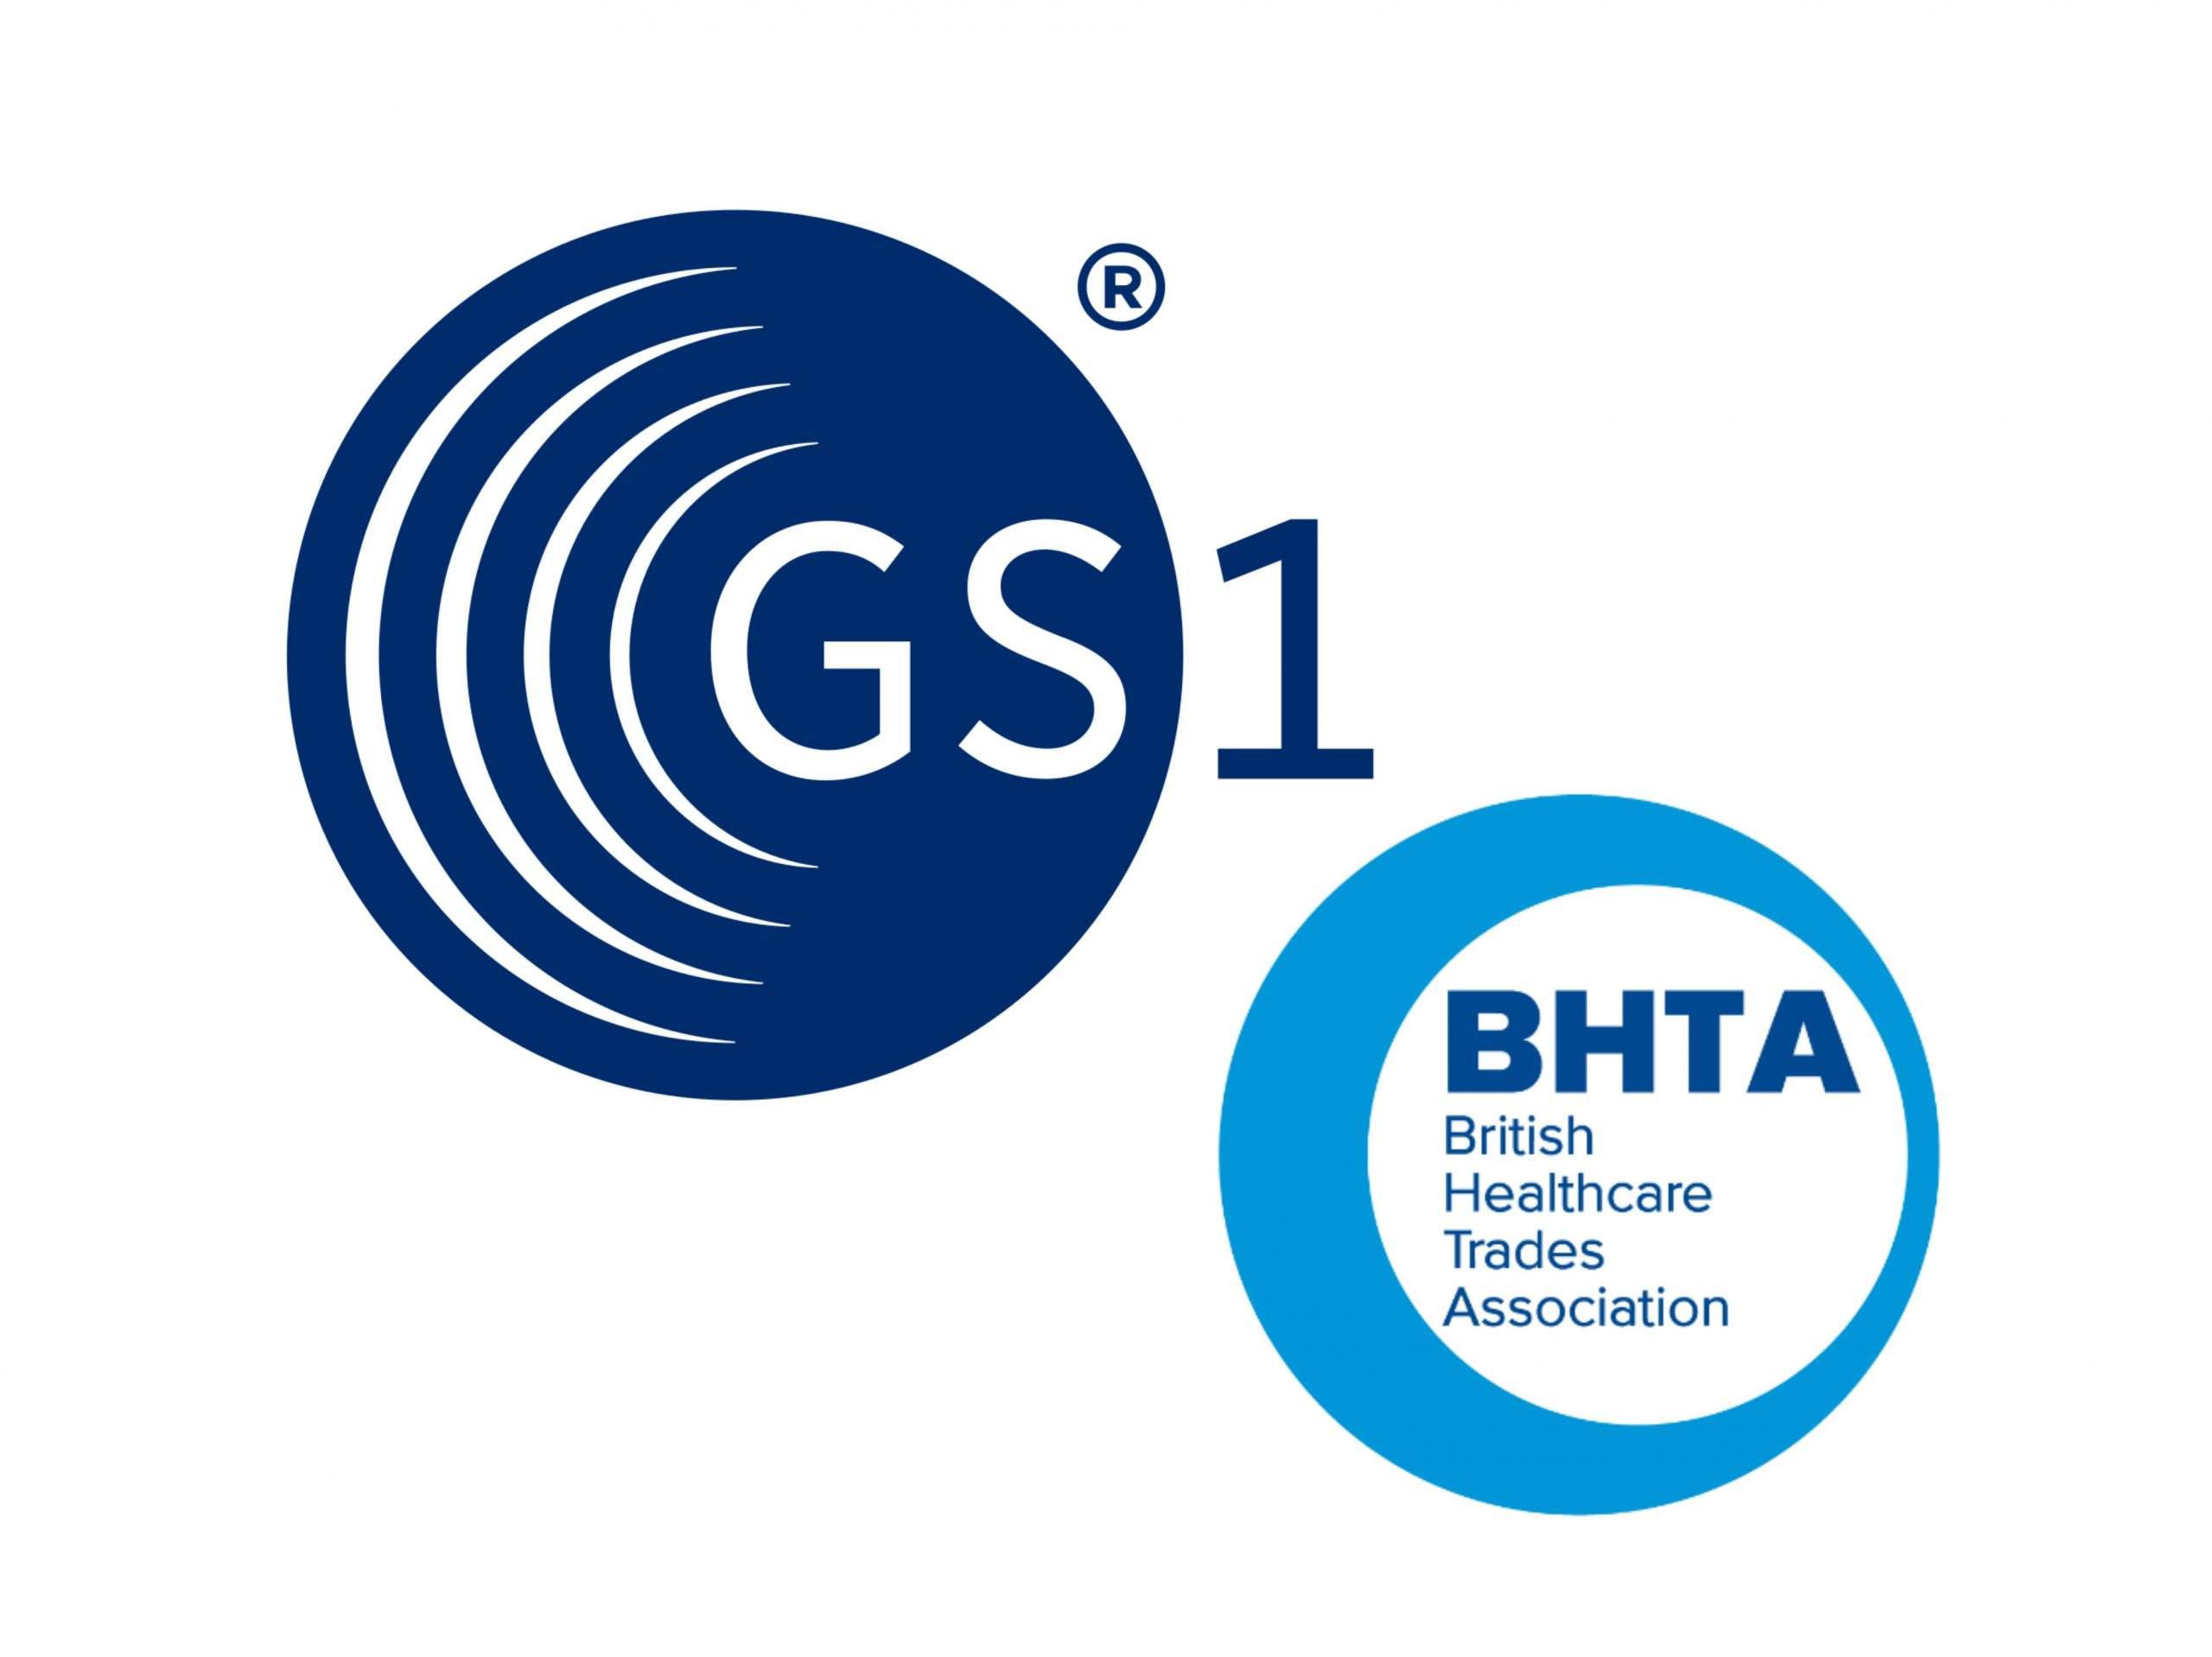 BHTA News No - 33407